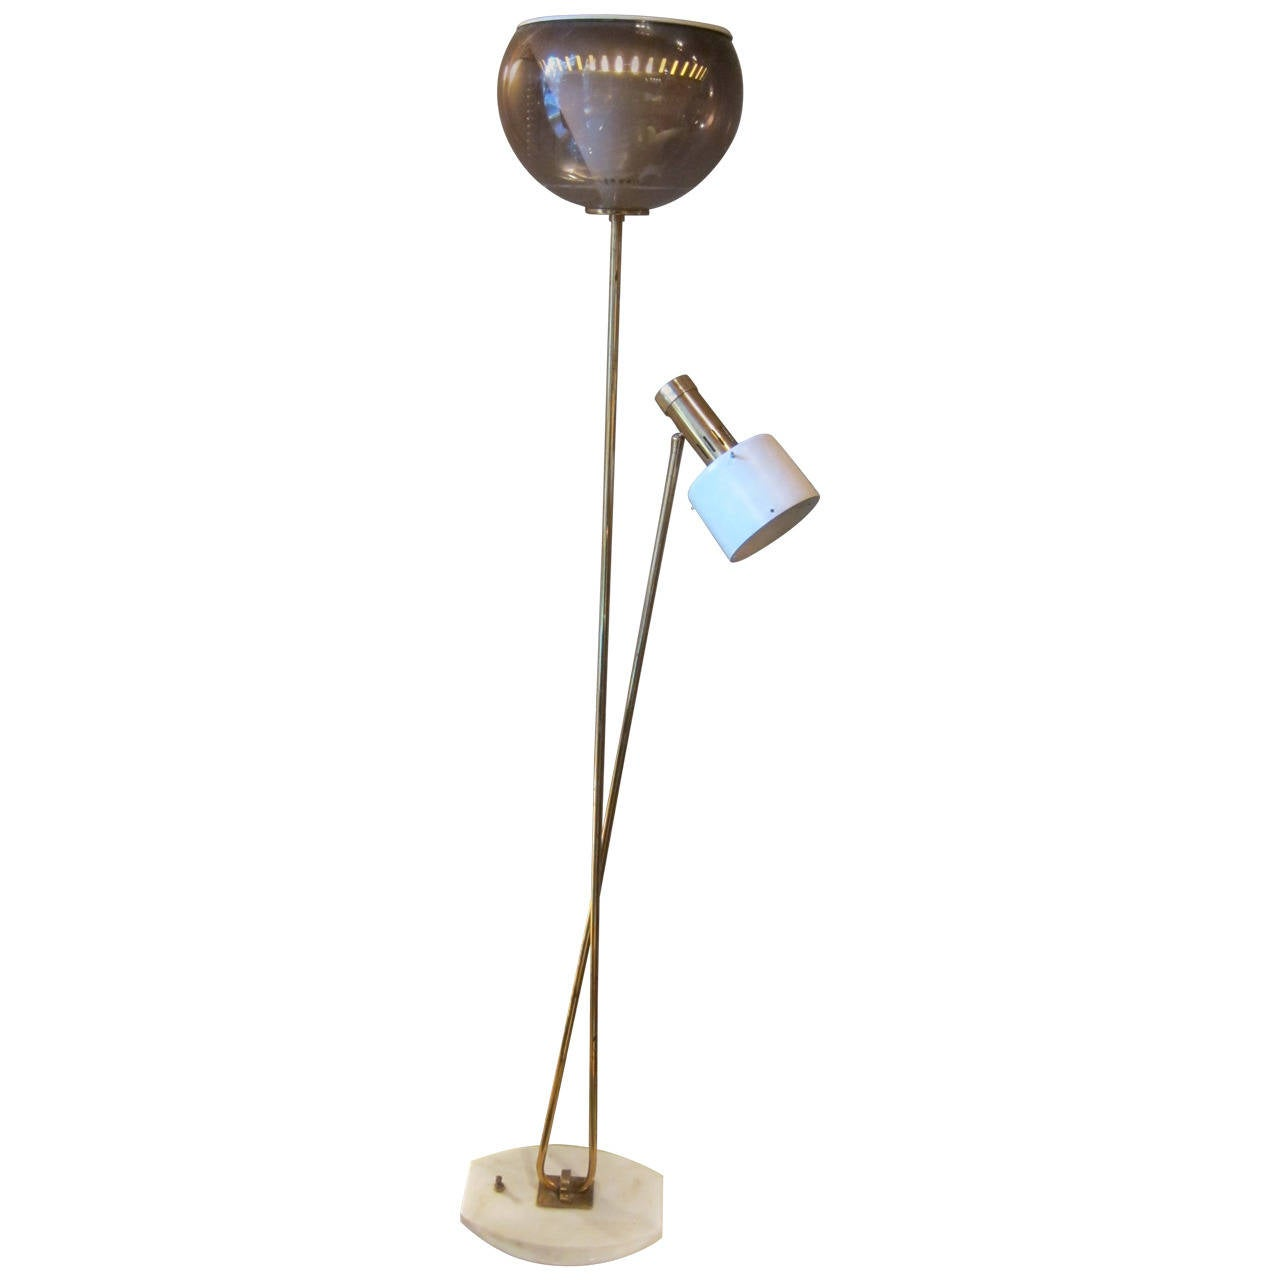 opaline and marble base floor lamp switzerland 1950 at 1stdibs. Black Bedroom Furniture Sets. Home Design Ideas